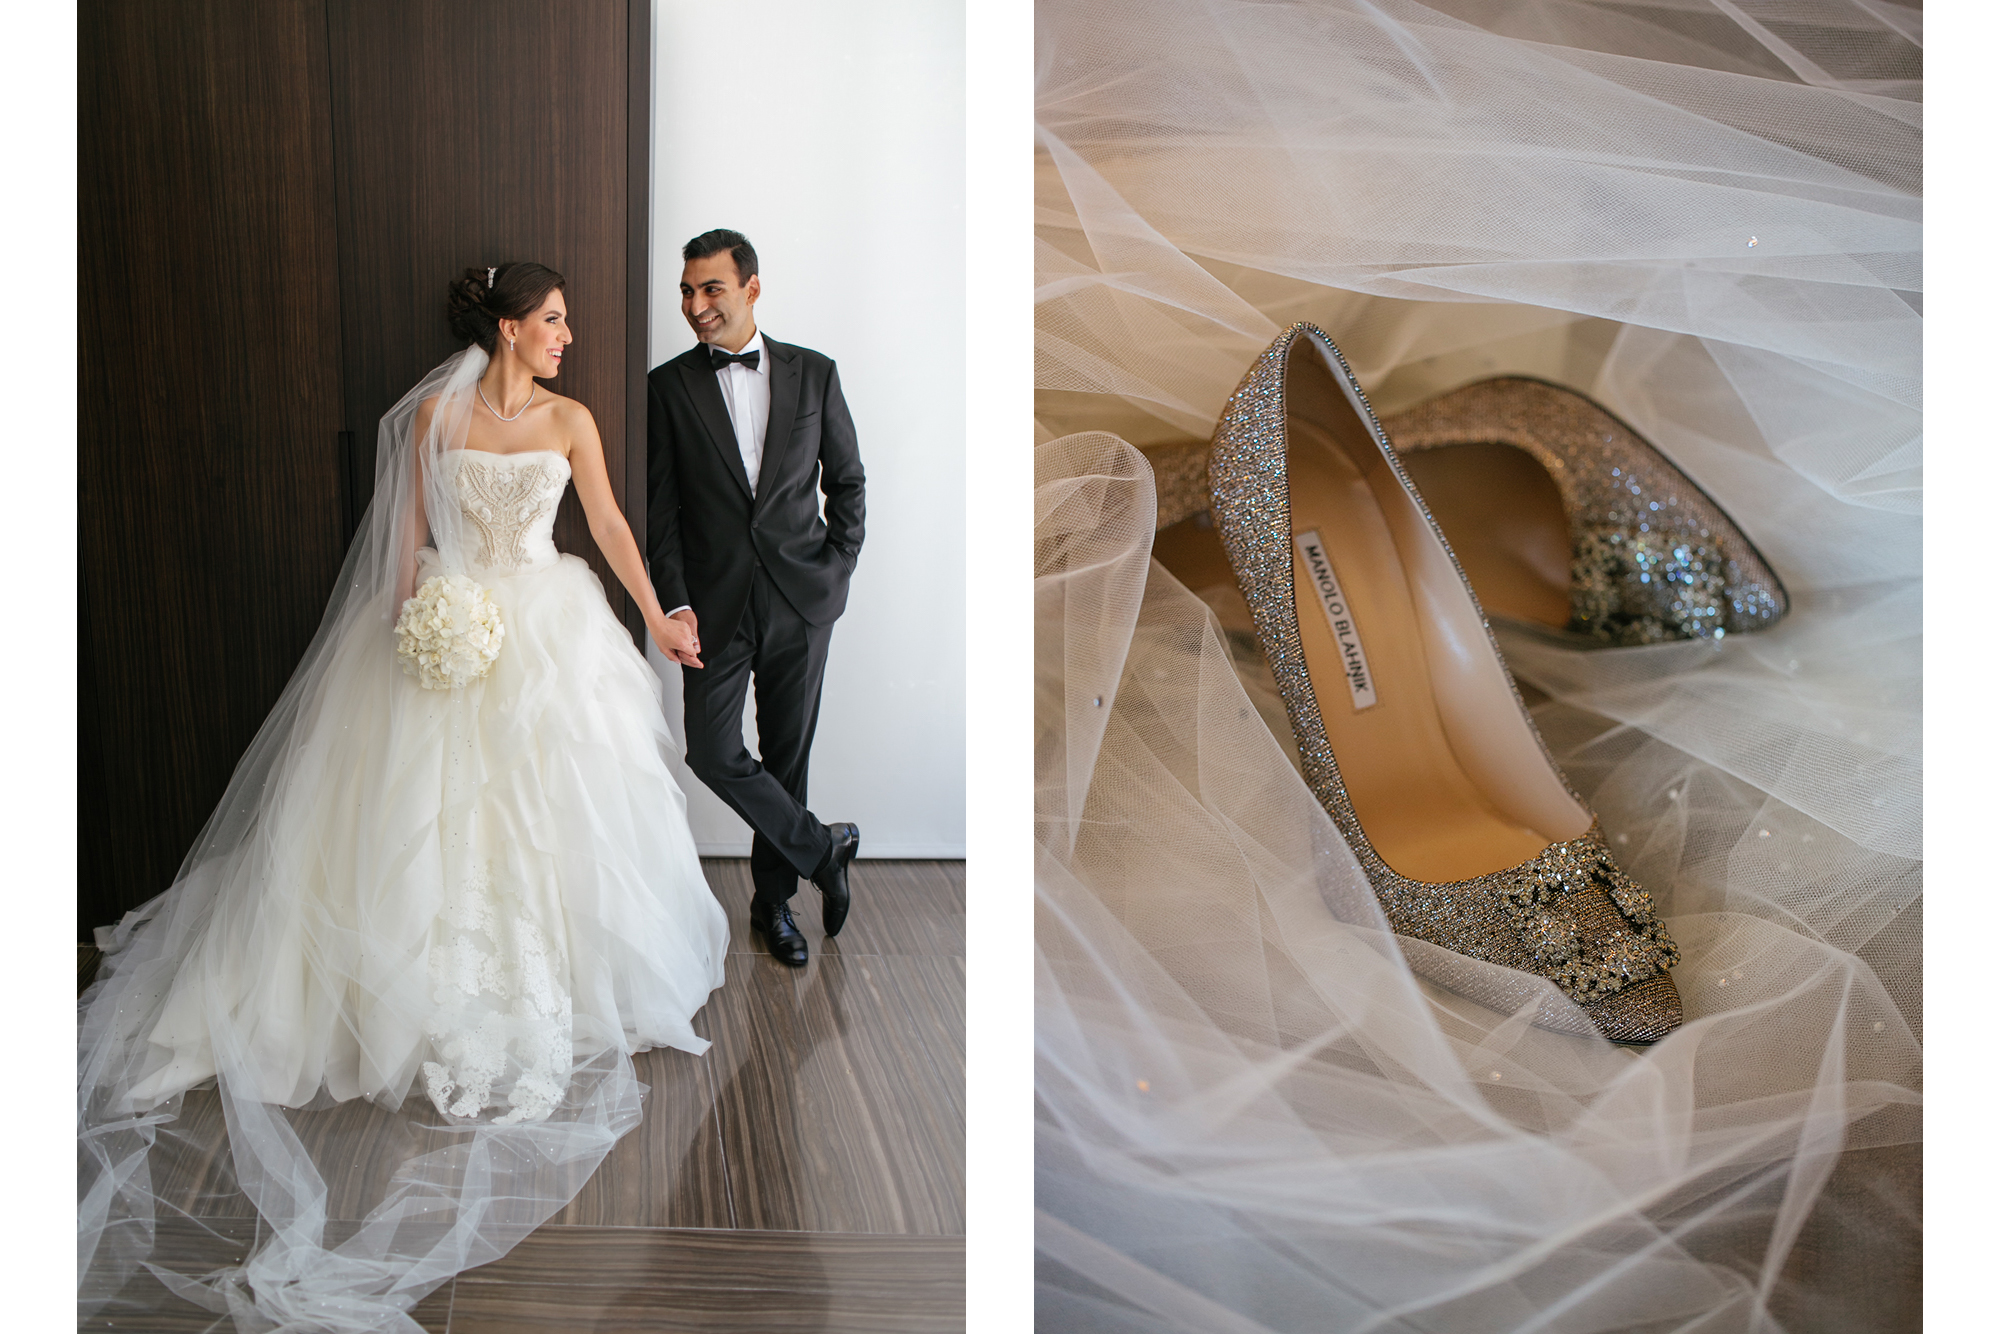 vancouver-luxury-wedding-photographer-lori-miles-38.jpg